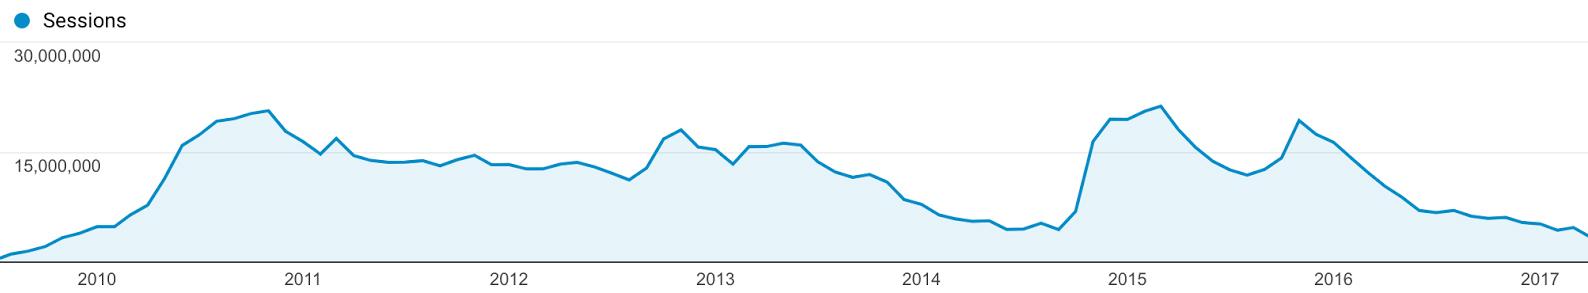 Directlyrics' traffic from 2010 through 2017